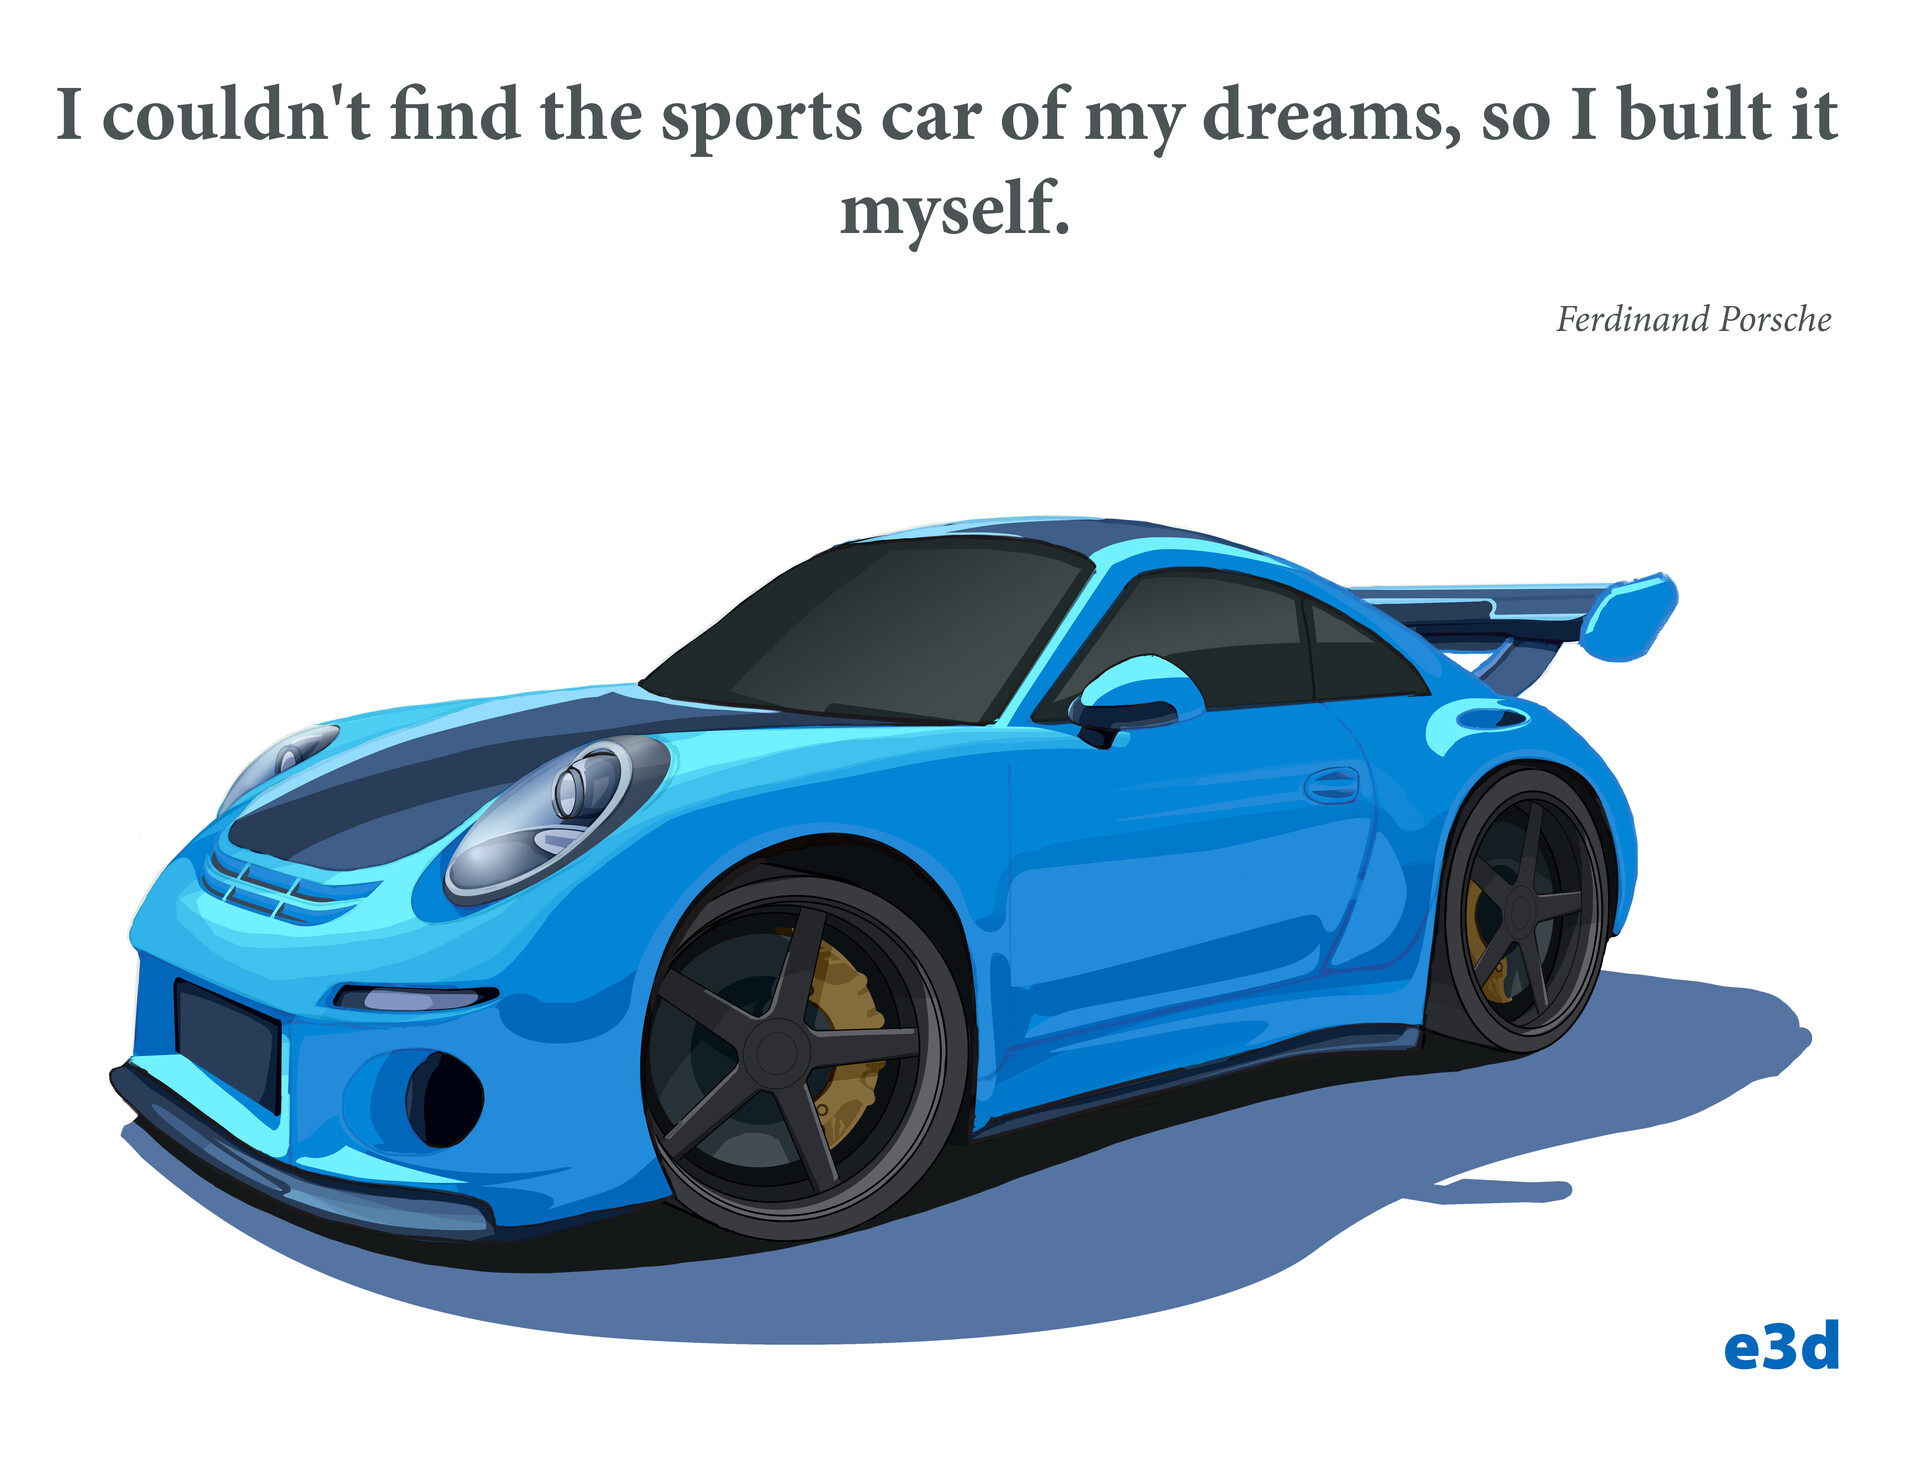 Porsche lovers everywhere